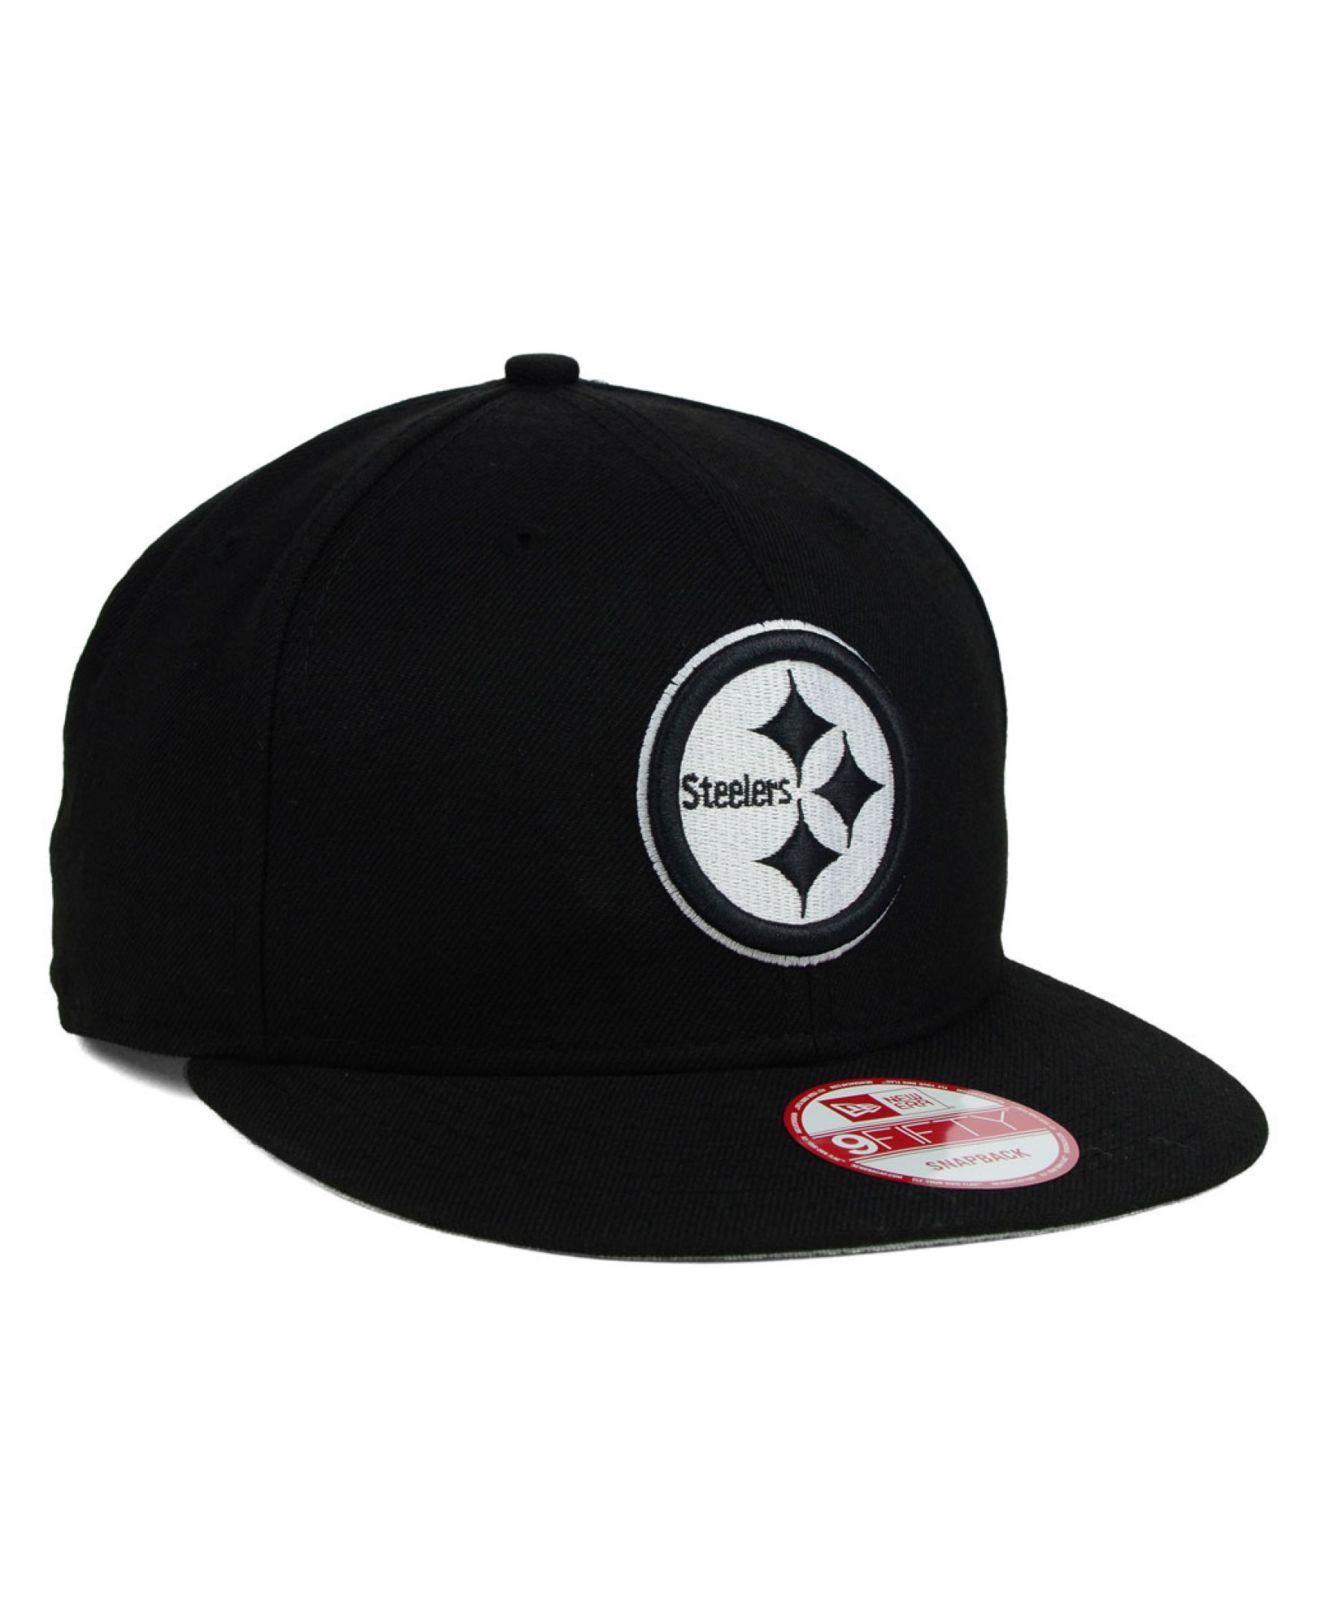 43d527e17 Lyst - KTZ Pittsburgh Steelers Black White 9Fifty Snapback Cap in ...